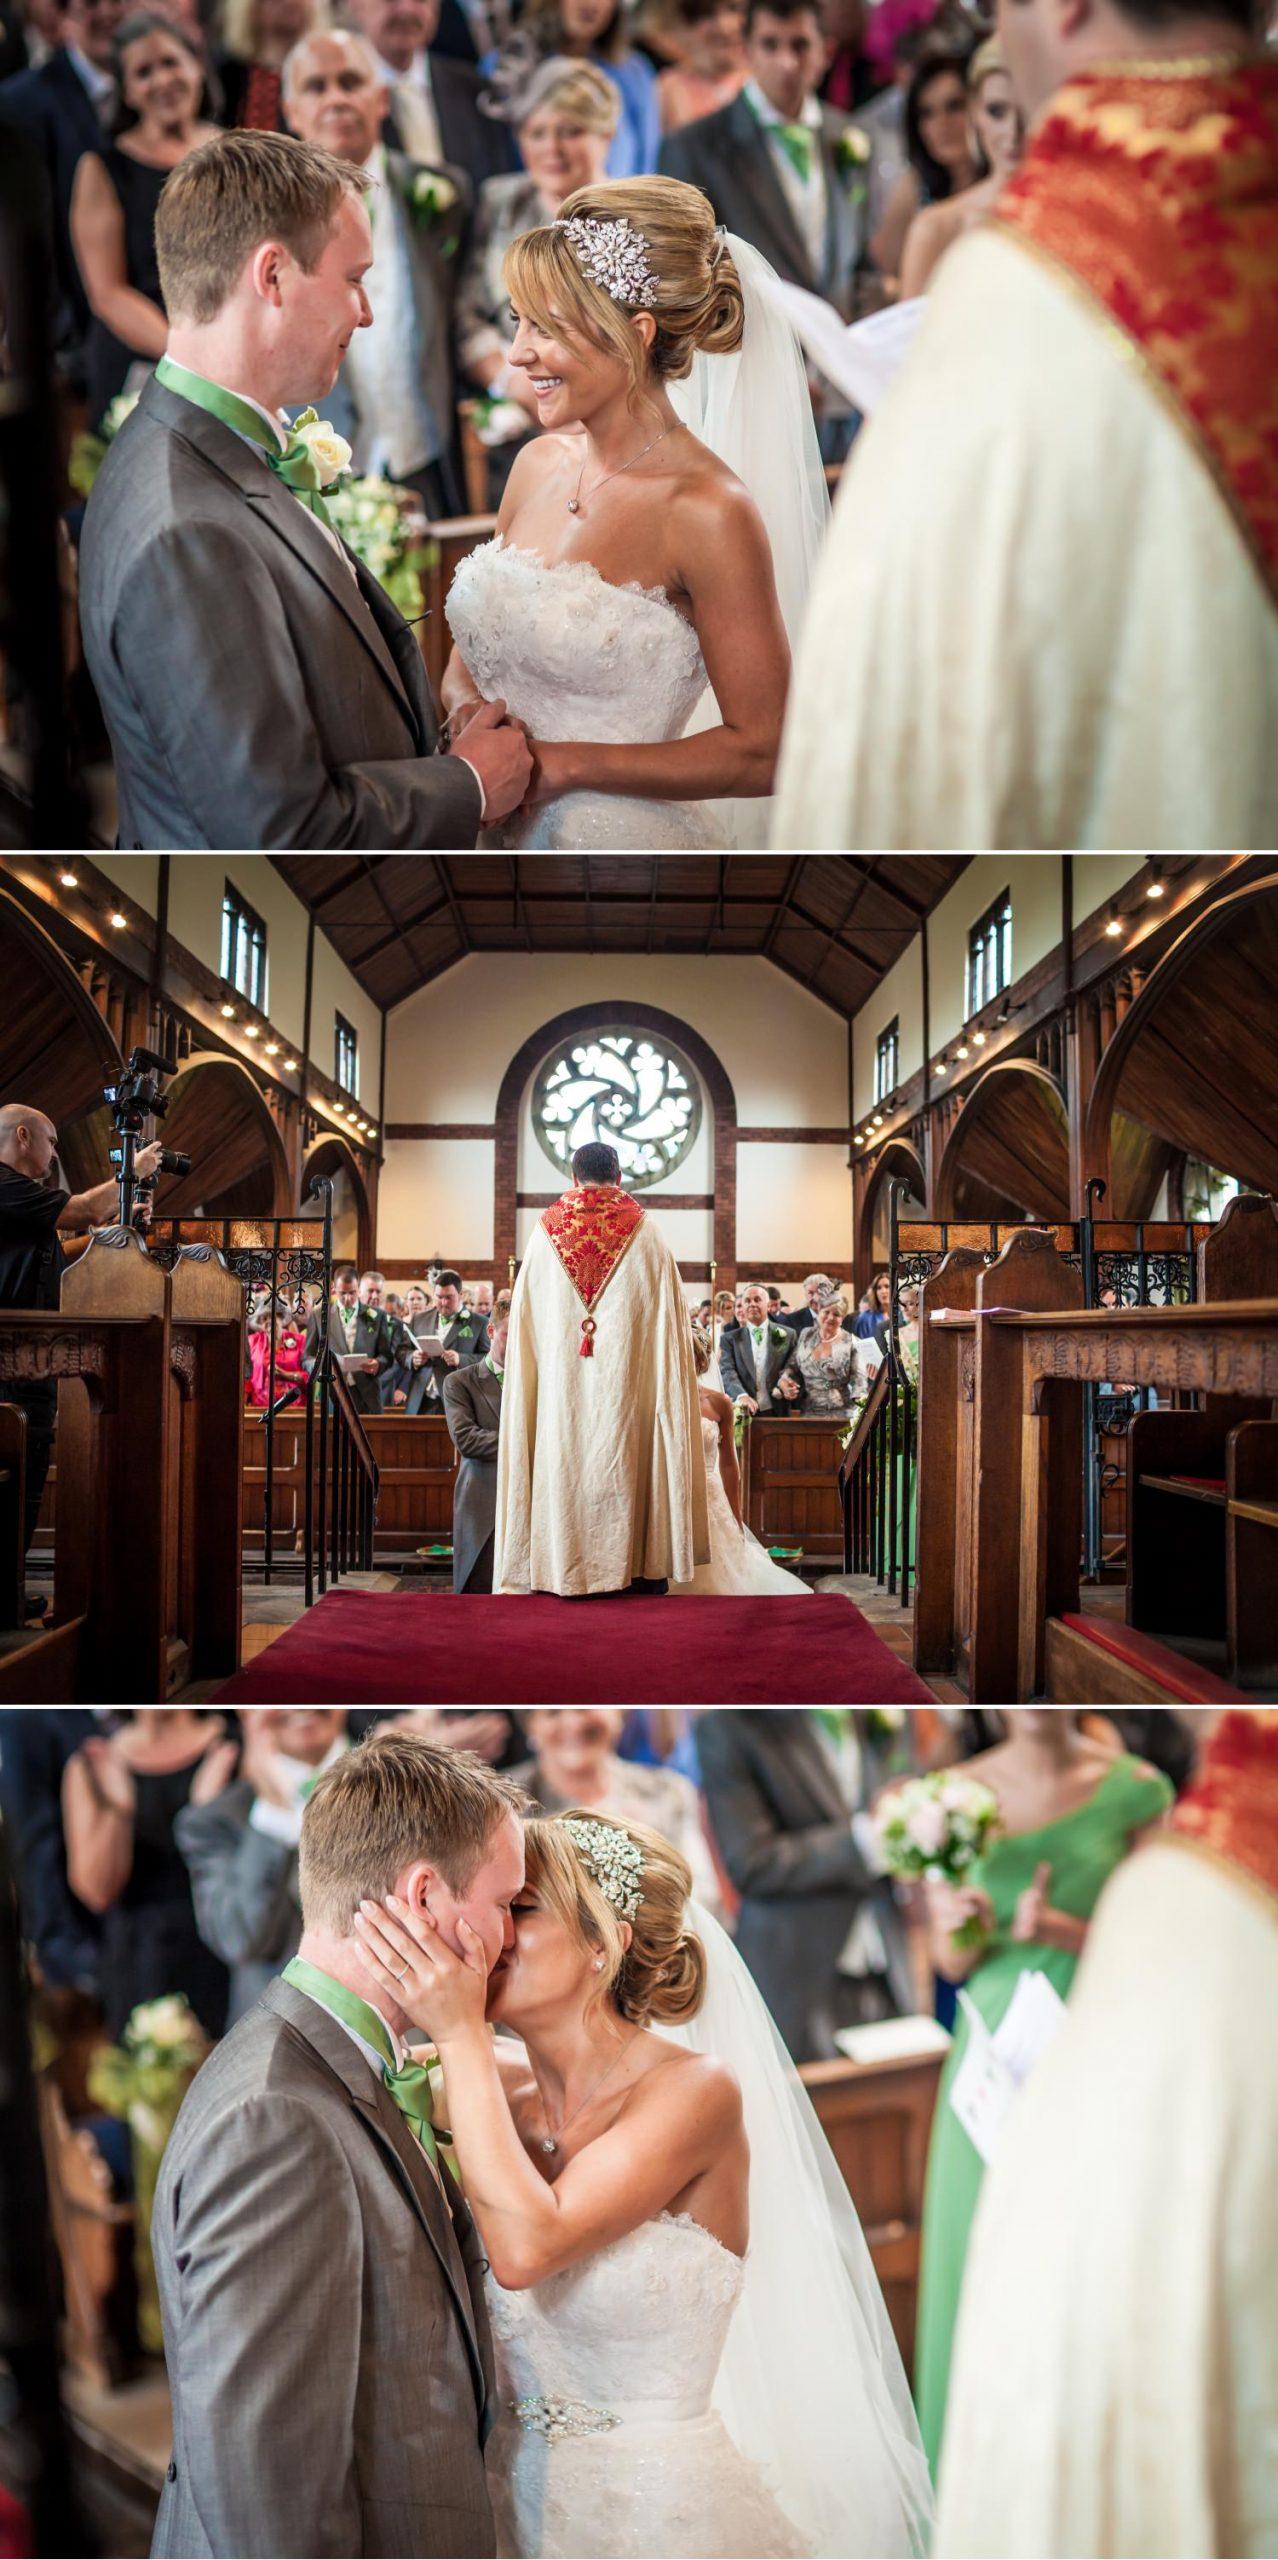 Peckforton Castle Wedding Photograp of ceremony in Cheshire